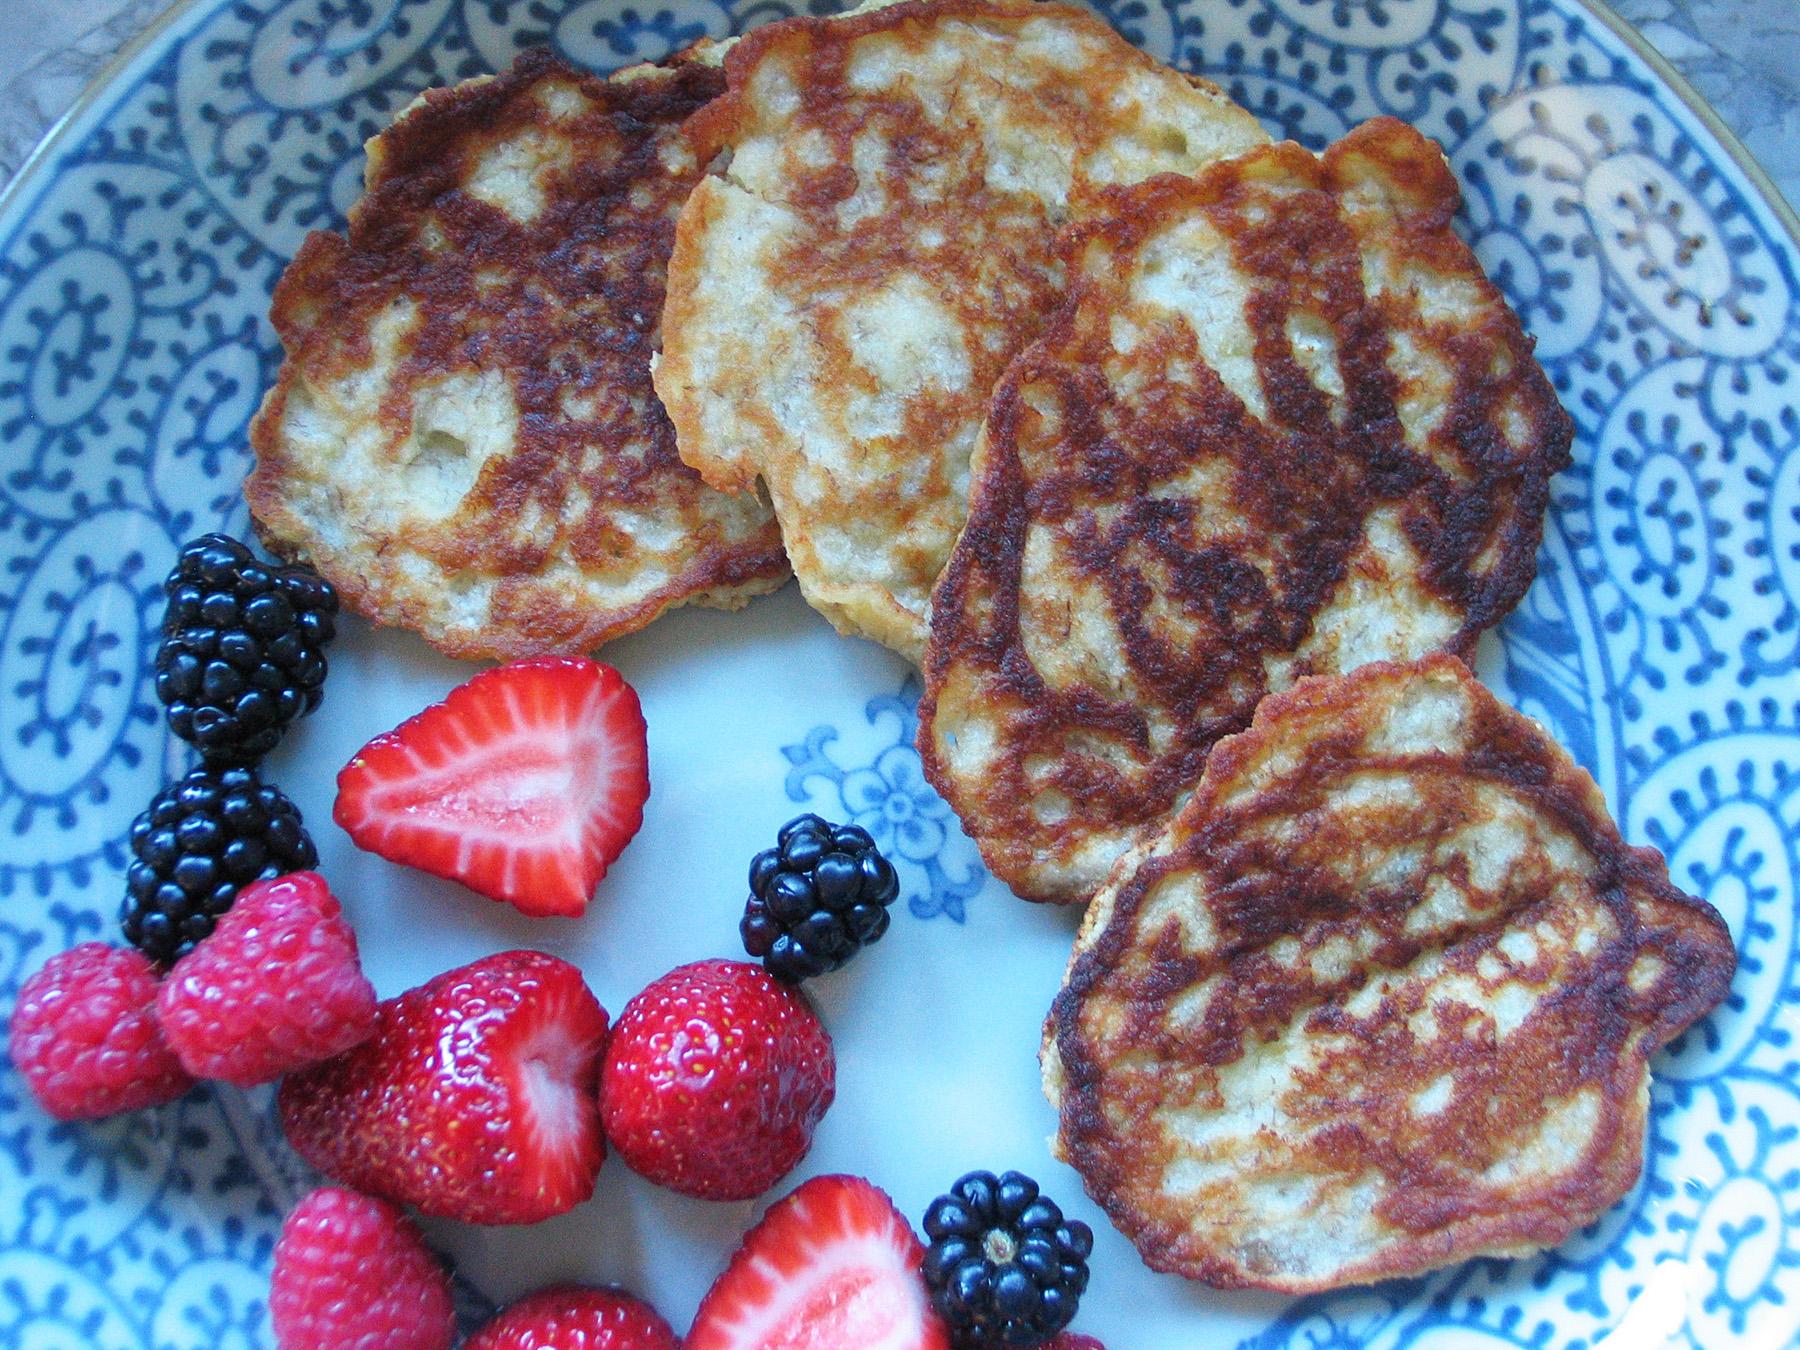 Banana Egg Pancakes (Gluten-free)